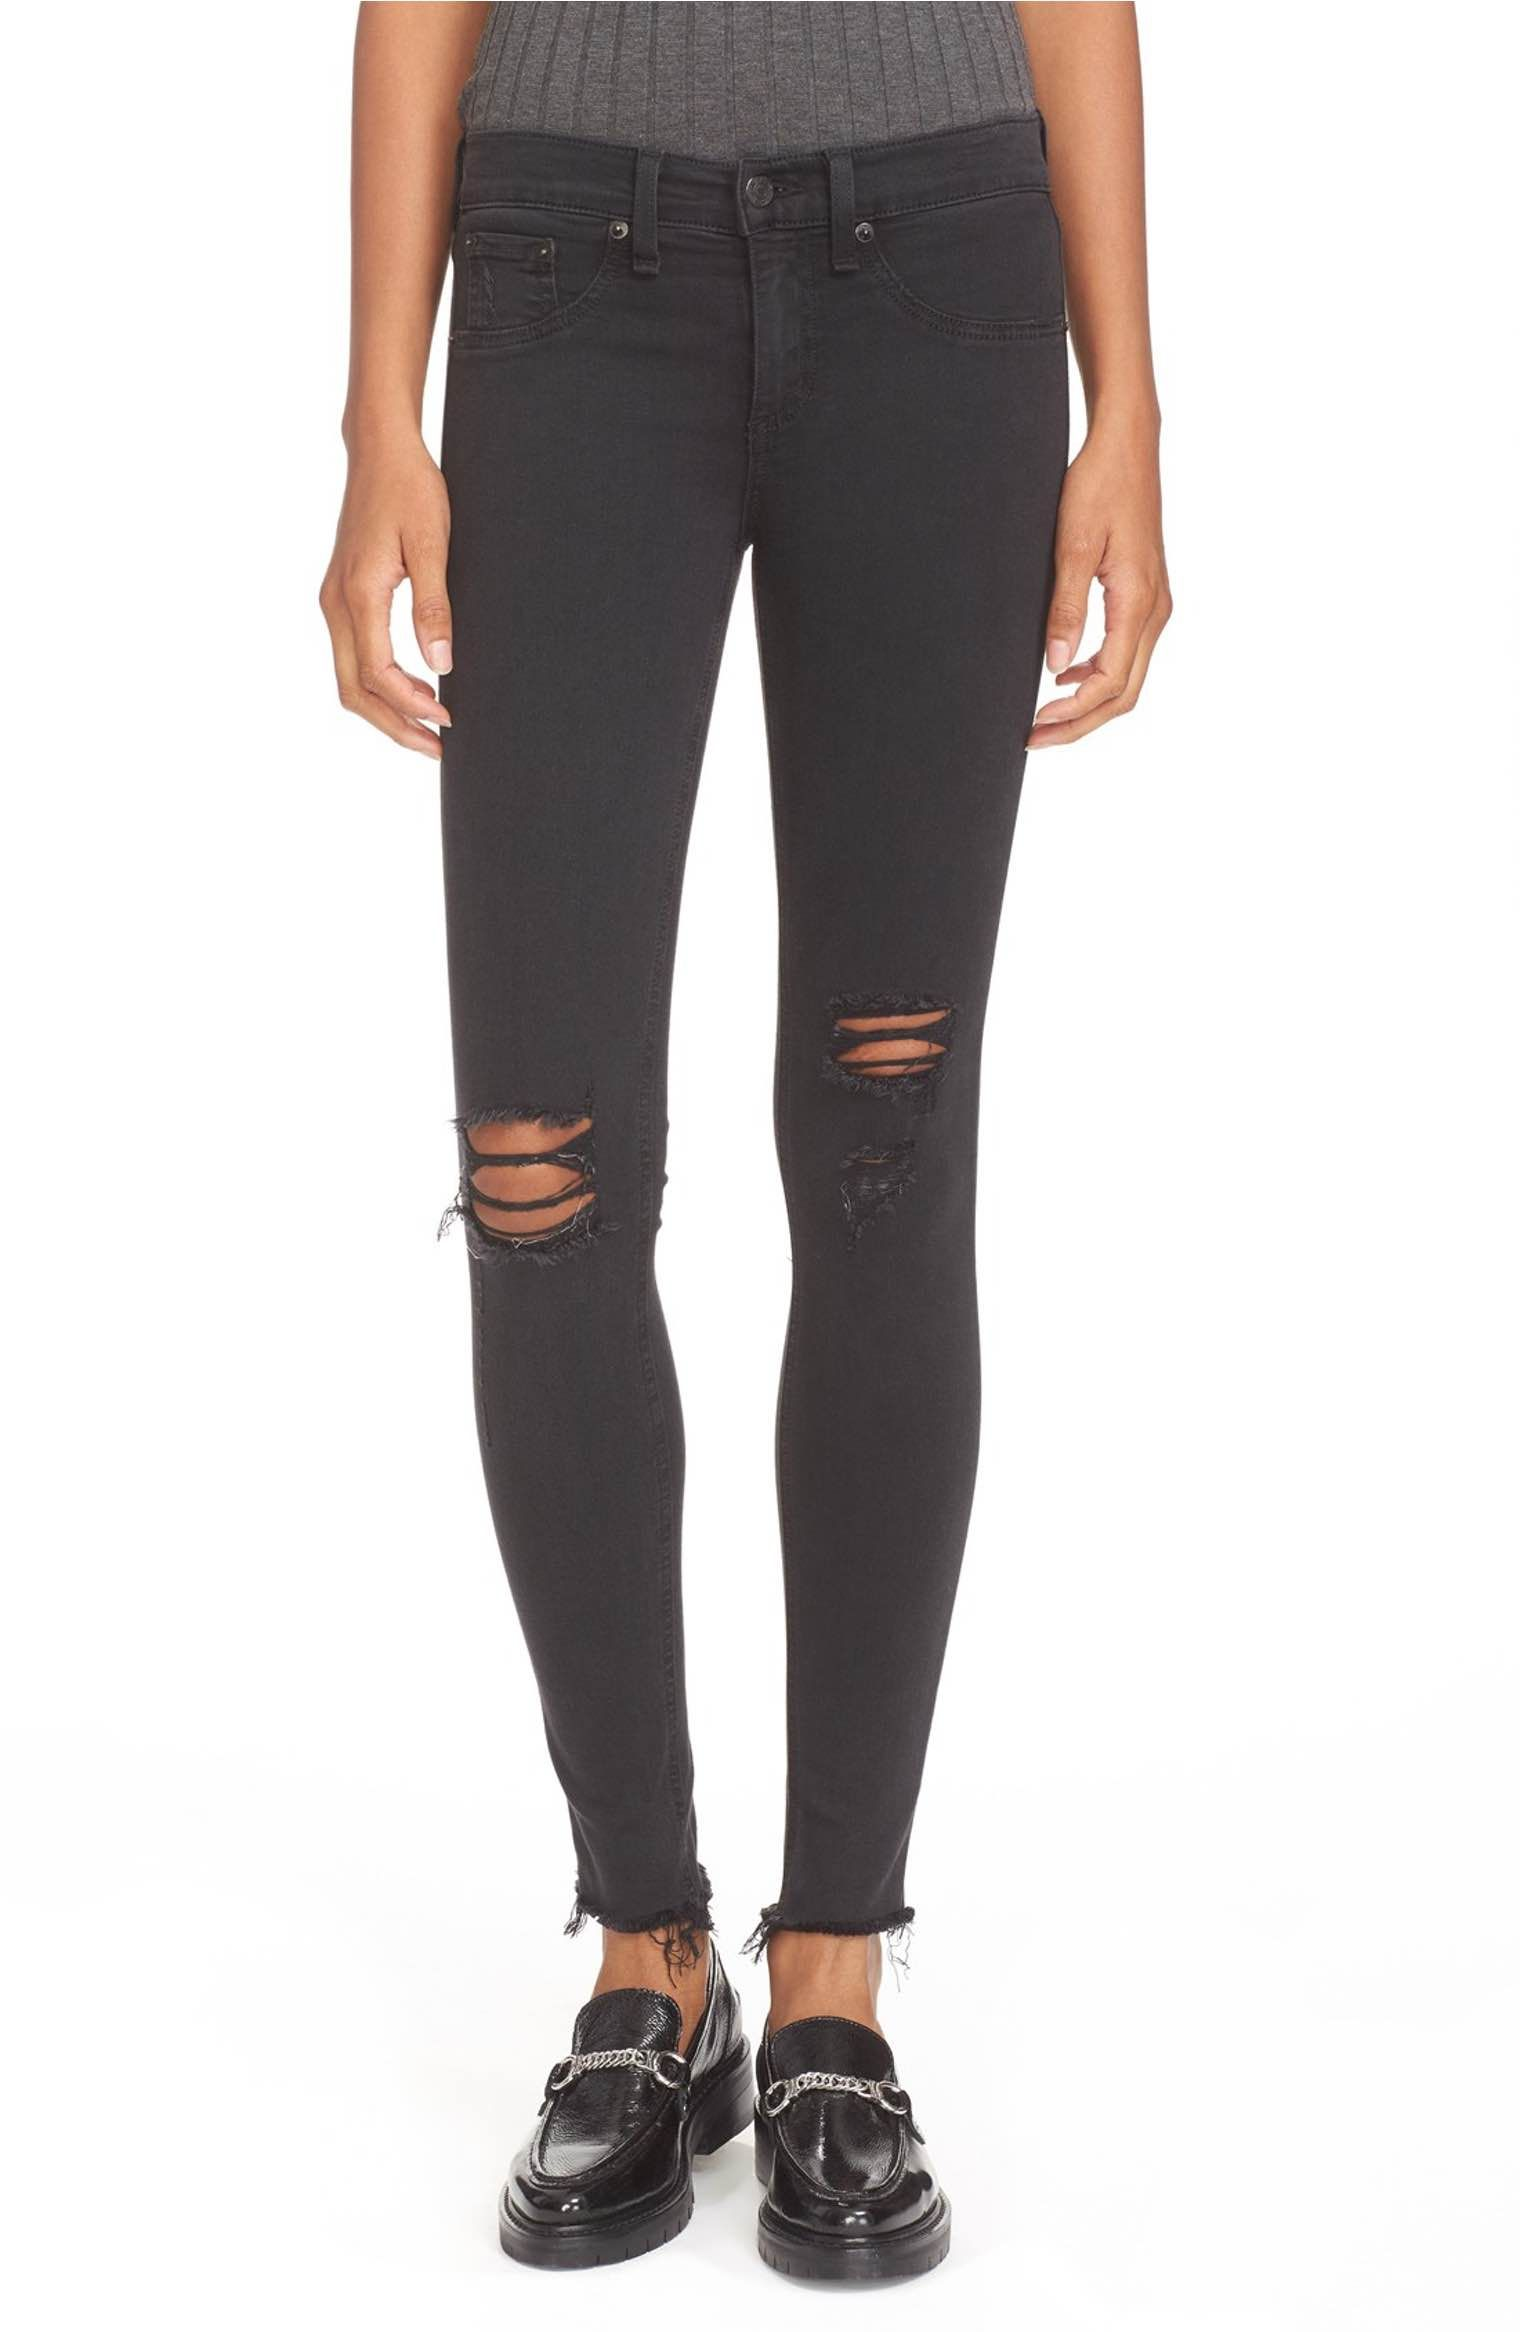 bde82f4cac64c Main Image - rag & bone/JEAN Ripped Denim Leggings   fashion style ...